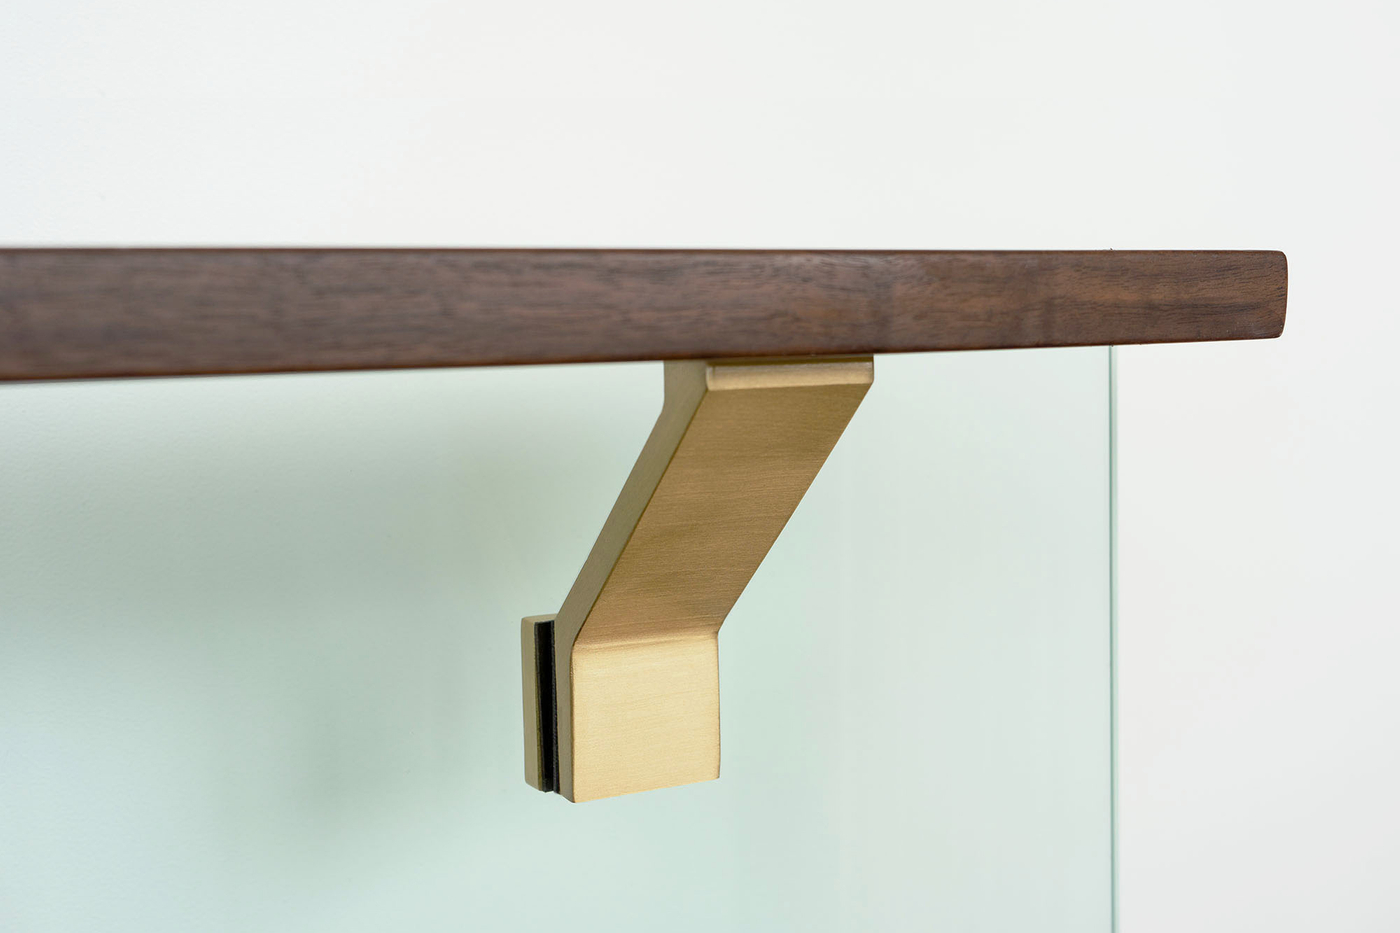 Contemporary-glass-mounted-brass-handrail-bracket